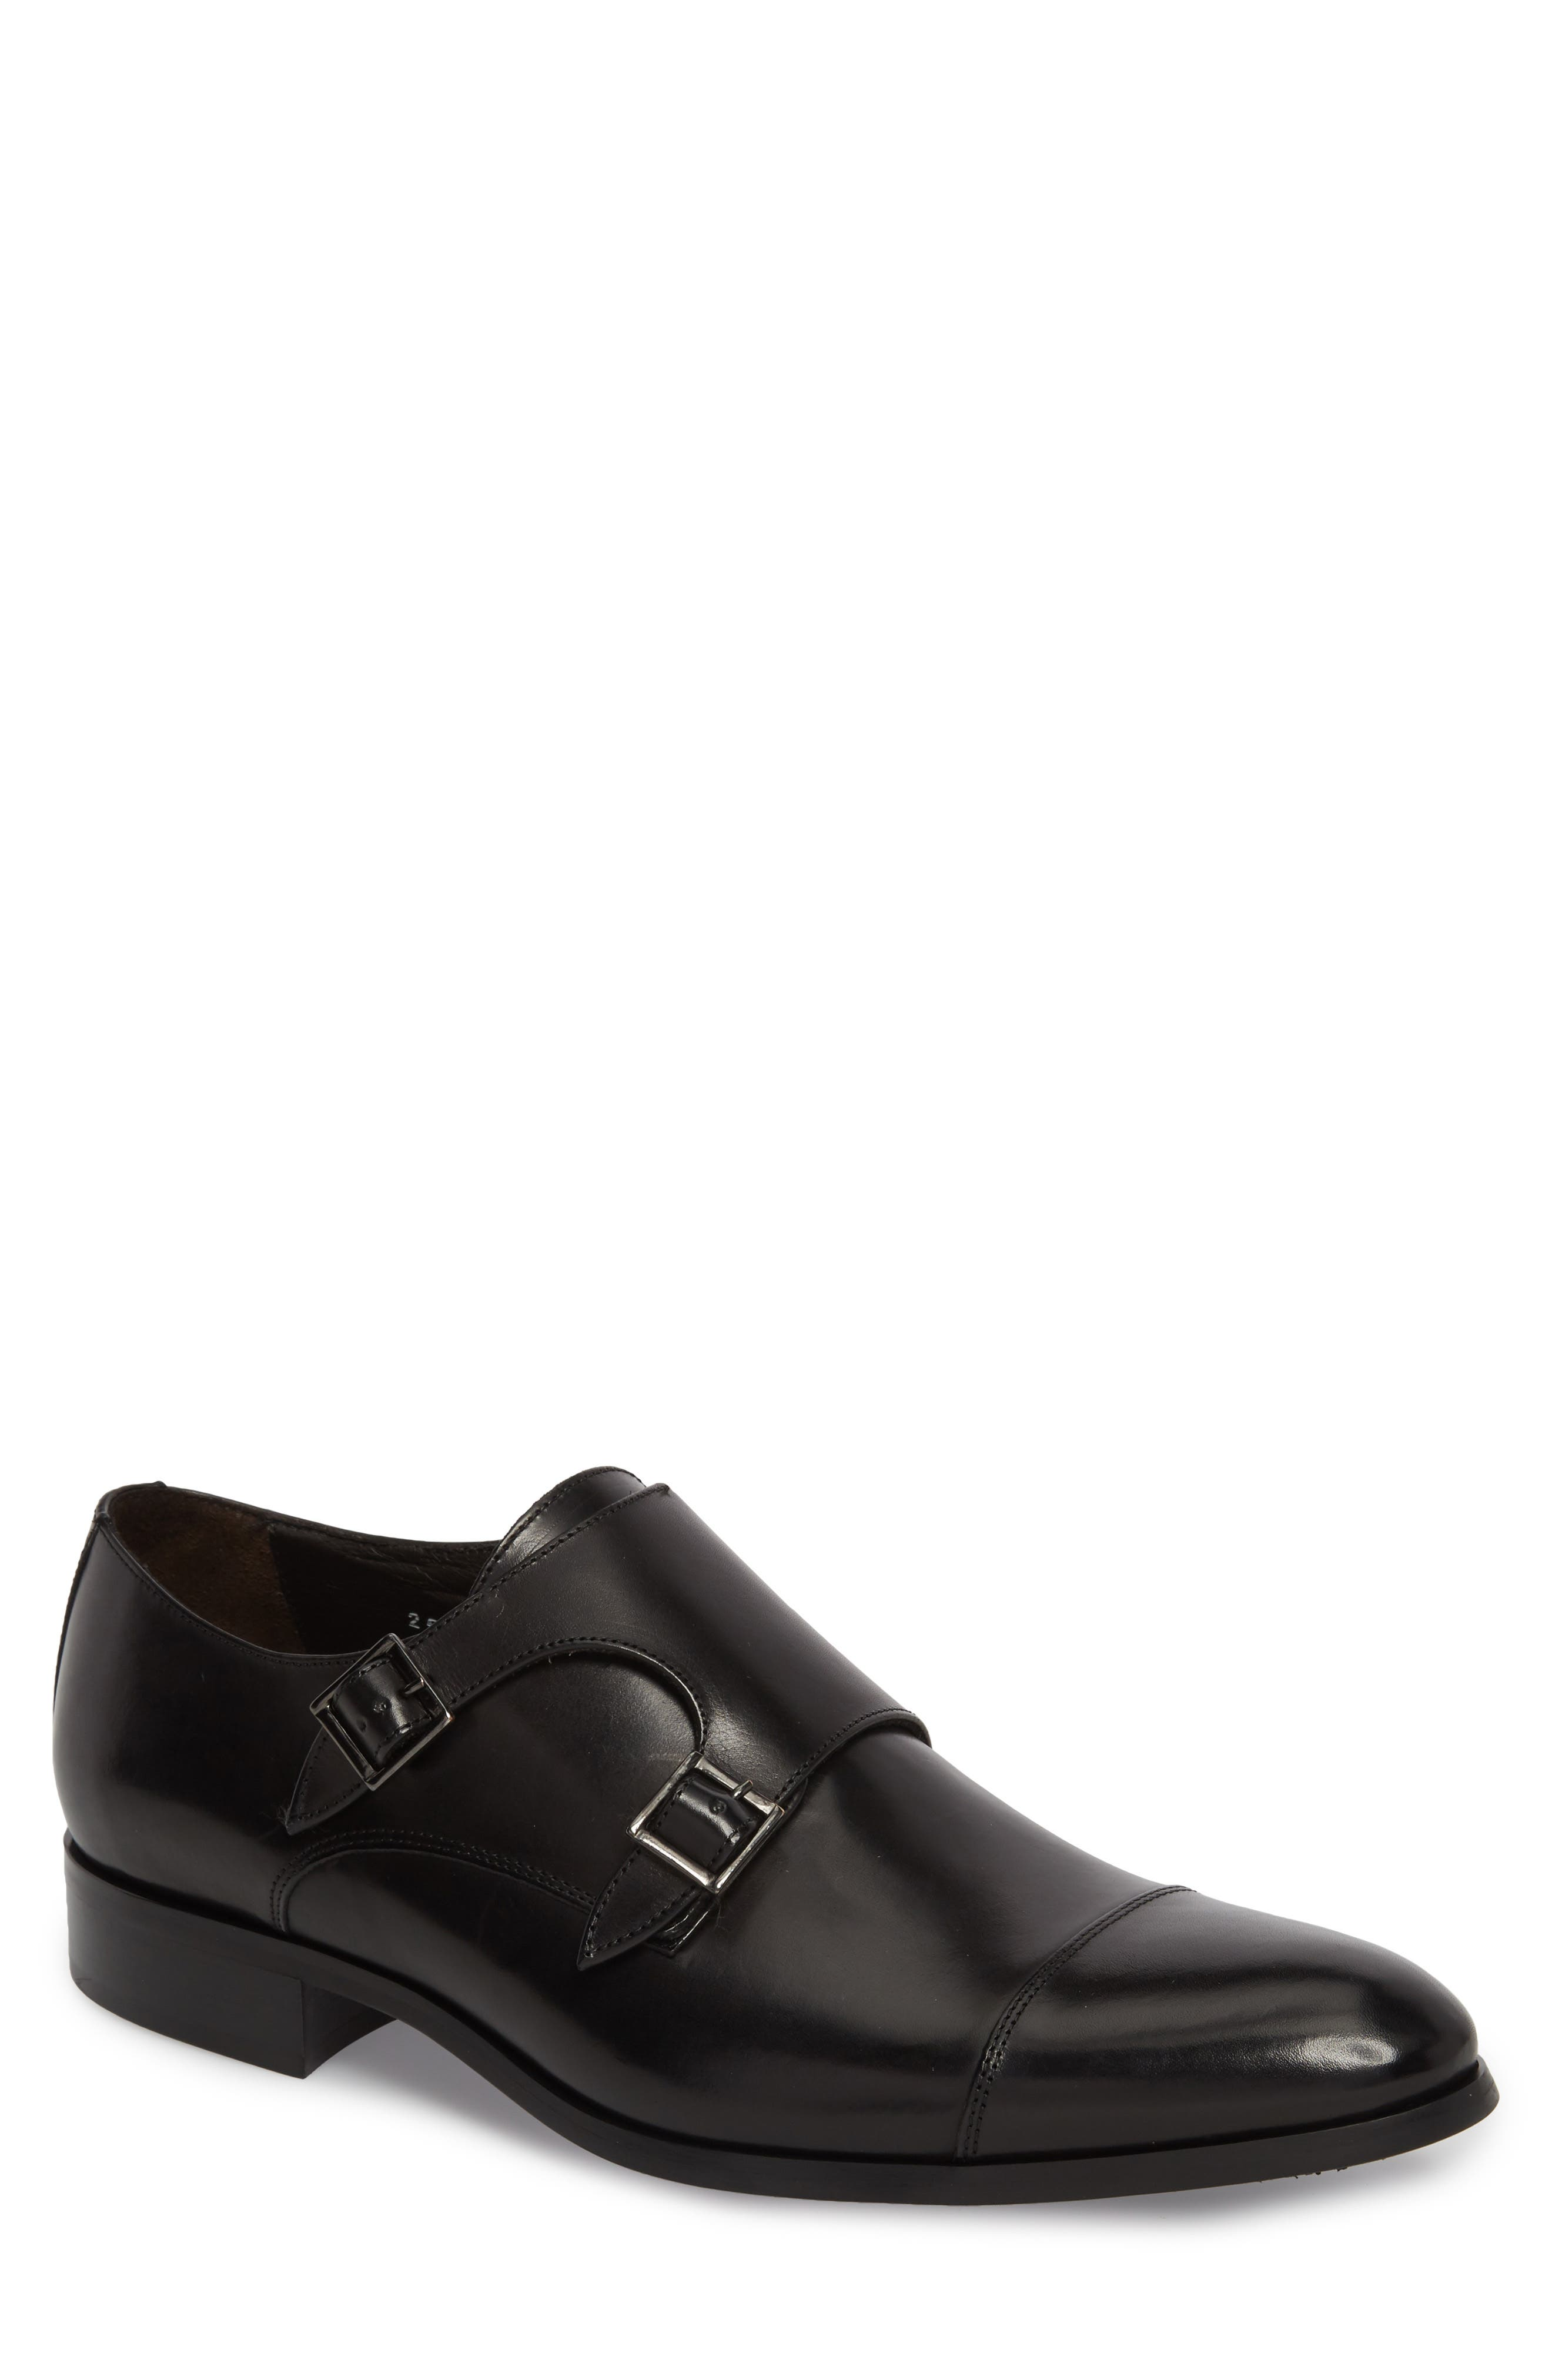 Bankston Cap Toe Double Strap Monk Shoe in Black Leather